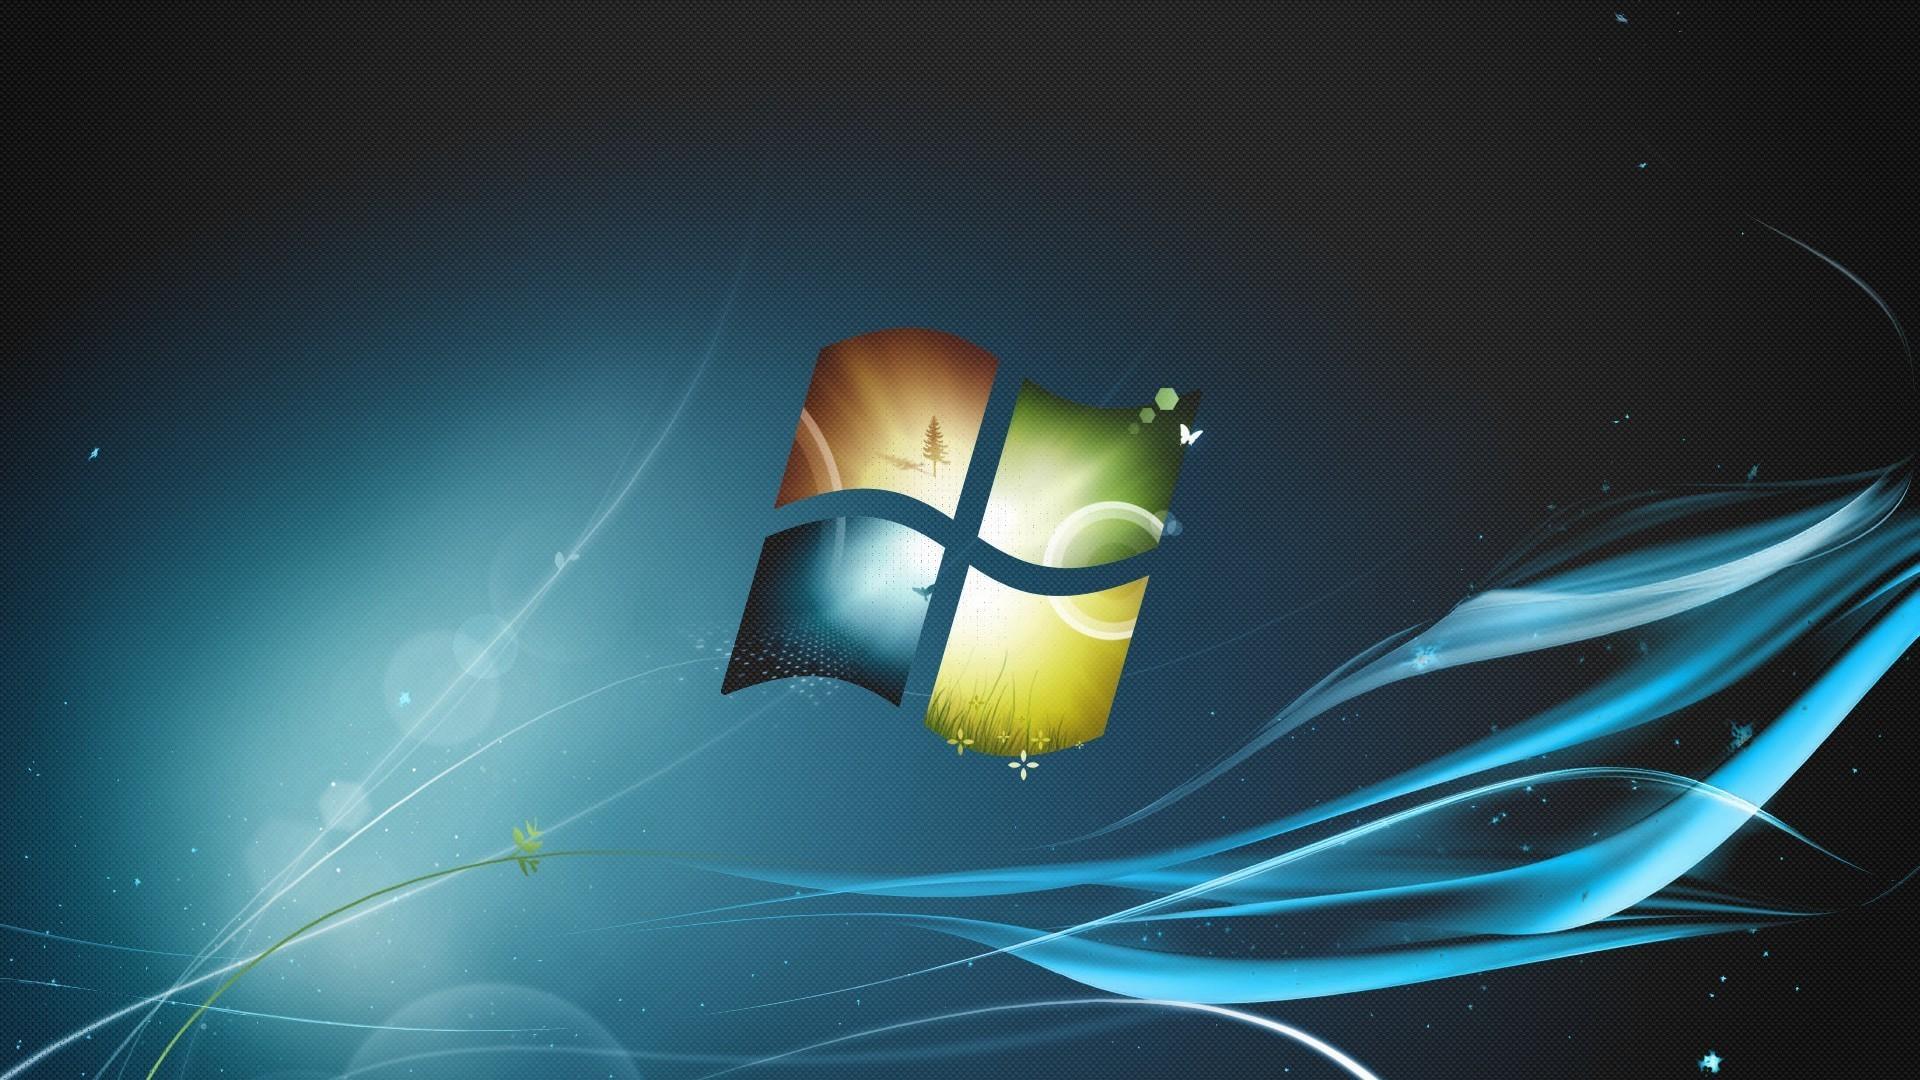 Wallpaper illustration logo microsoft windows windows - Windows 7 space wallpaper ...